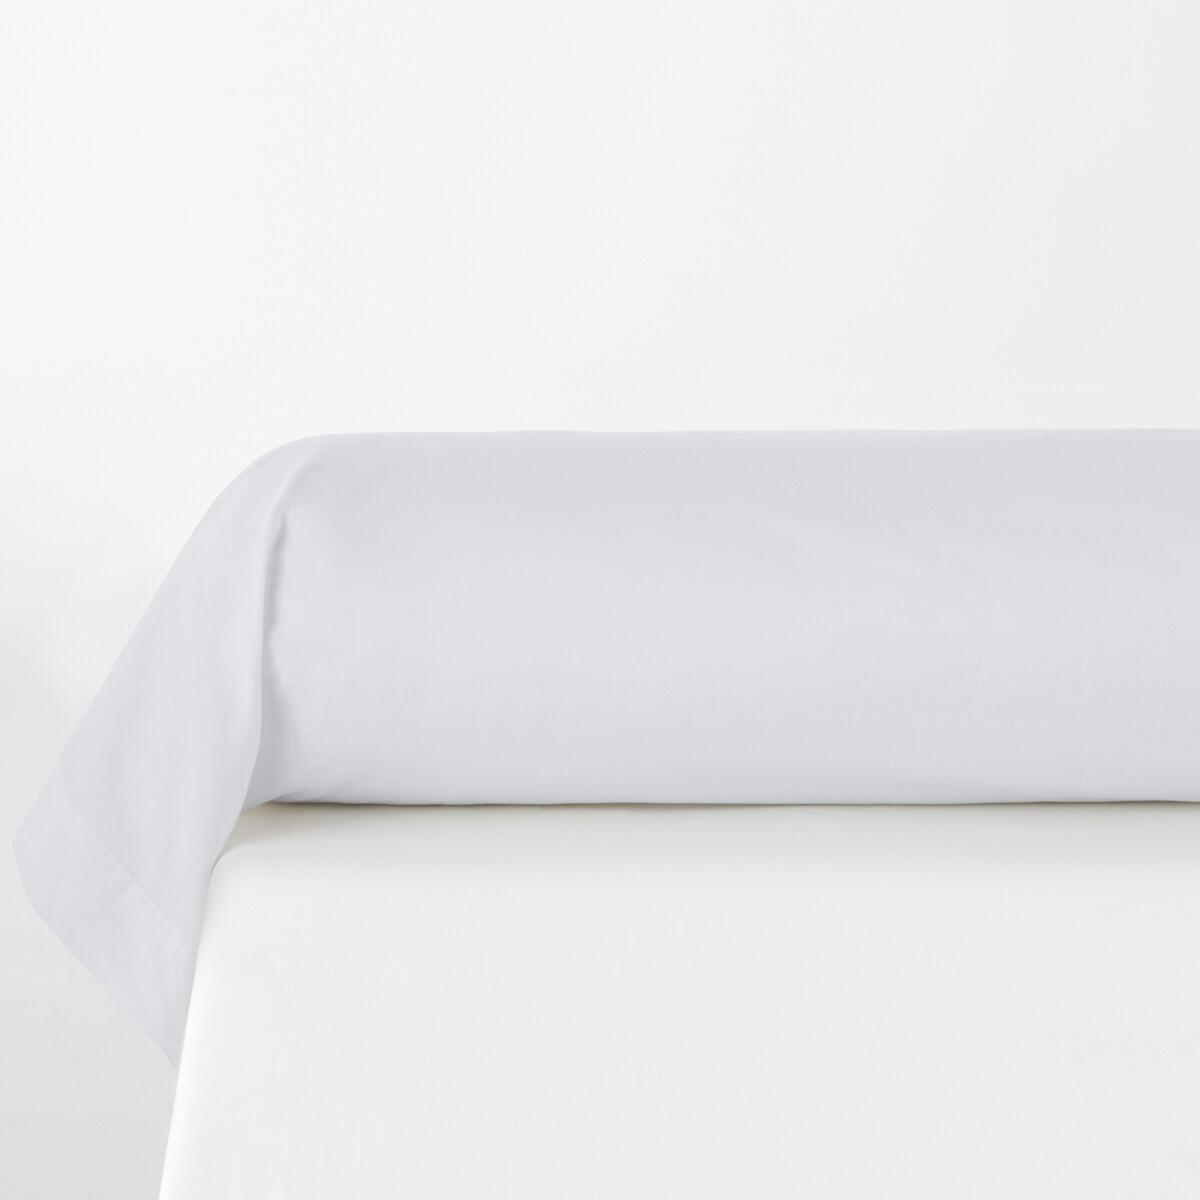 Фото - Наволочка LaRedoute На подушку-валик однотонная из стираного хлопка Scenario 85 x 185 см белый простыня laredoute однотонная из стираного хлопка mirni 240 x 290 см белый